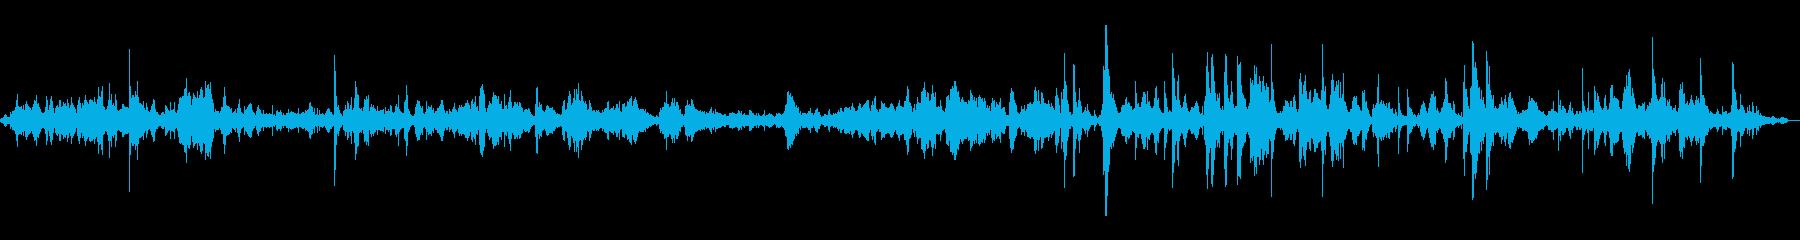 HUM OF VOICES、アメリ...の再生済みの波形